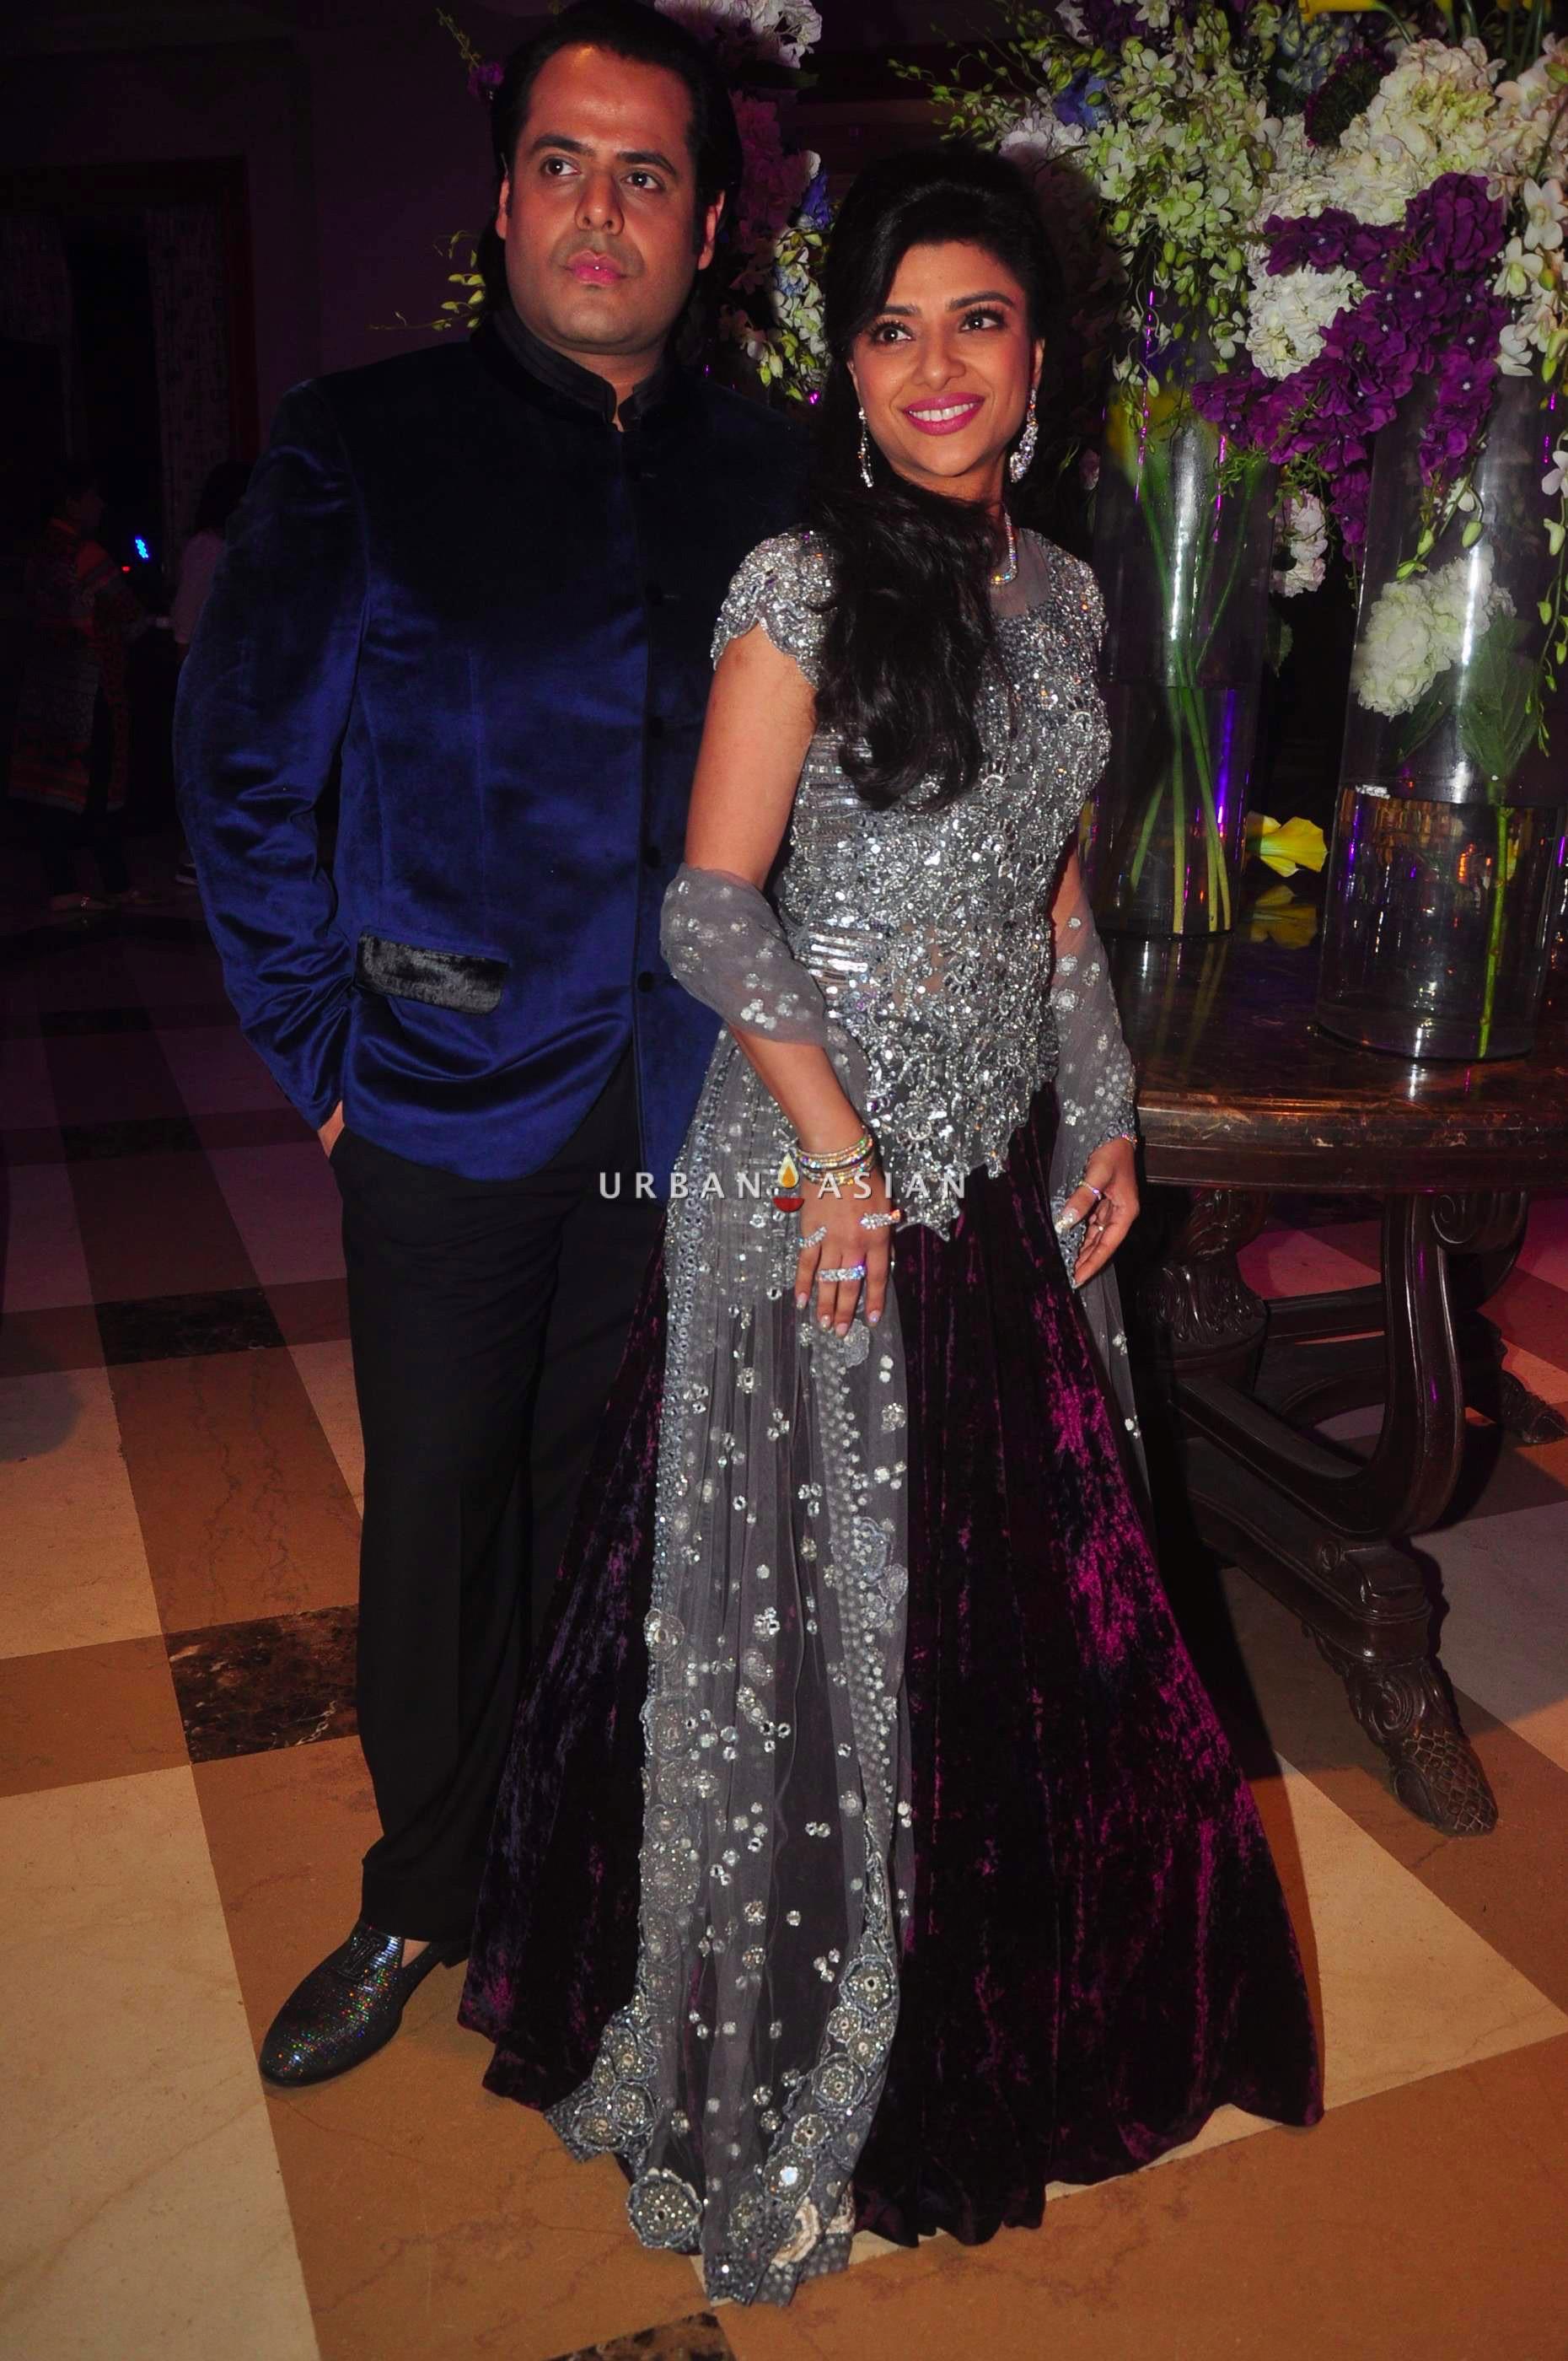 Uday Singh and Shirin1